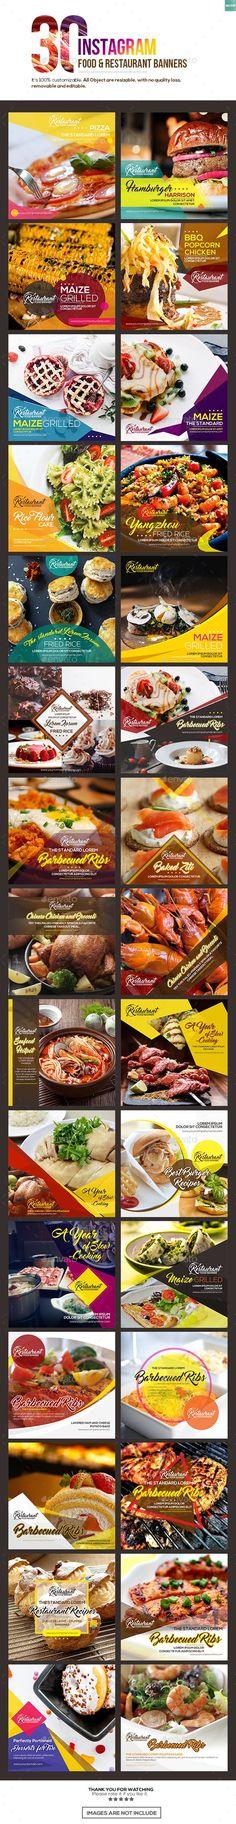 30 Instagram Food & Restaurant Banner Templates PSD